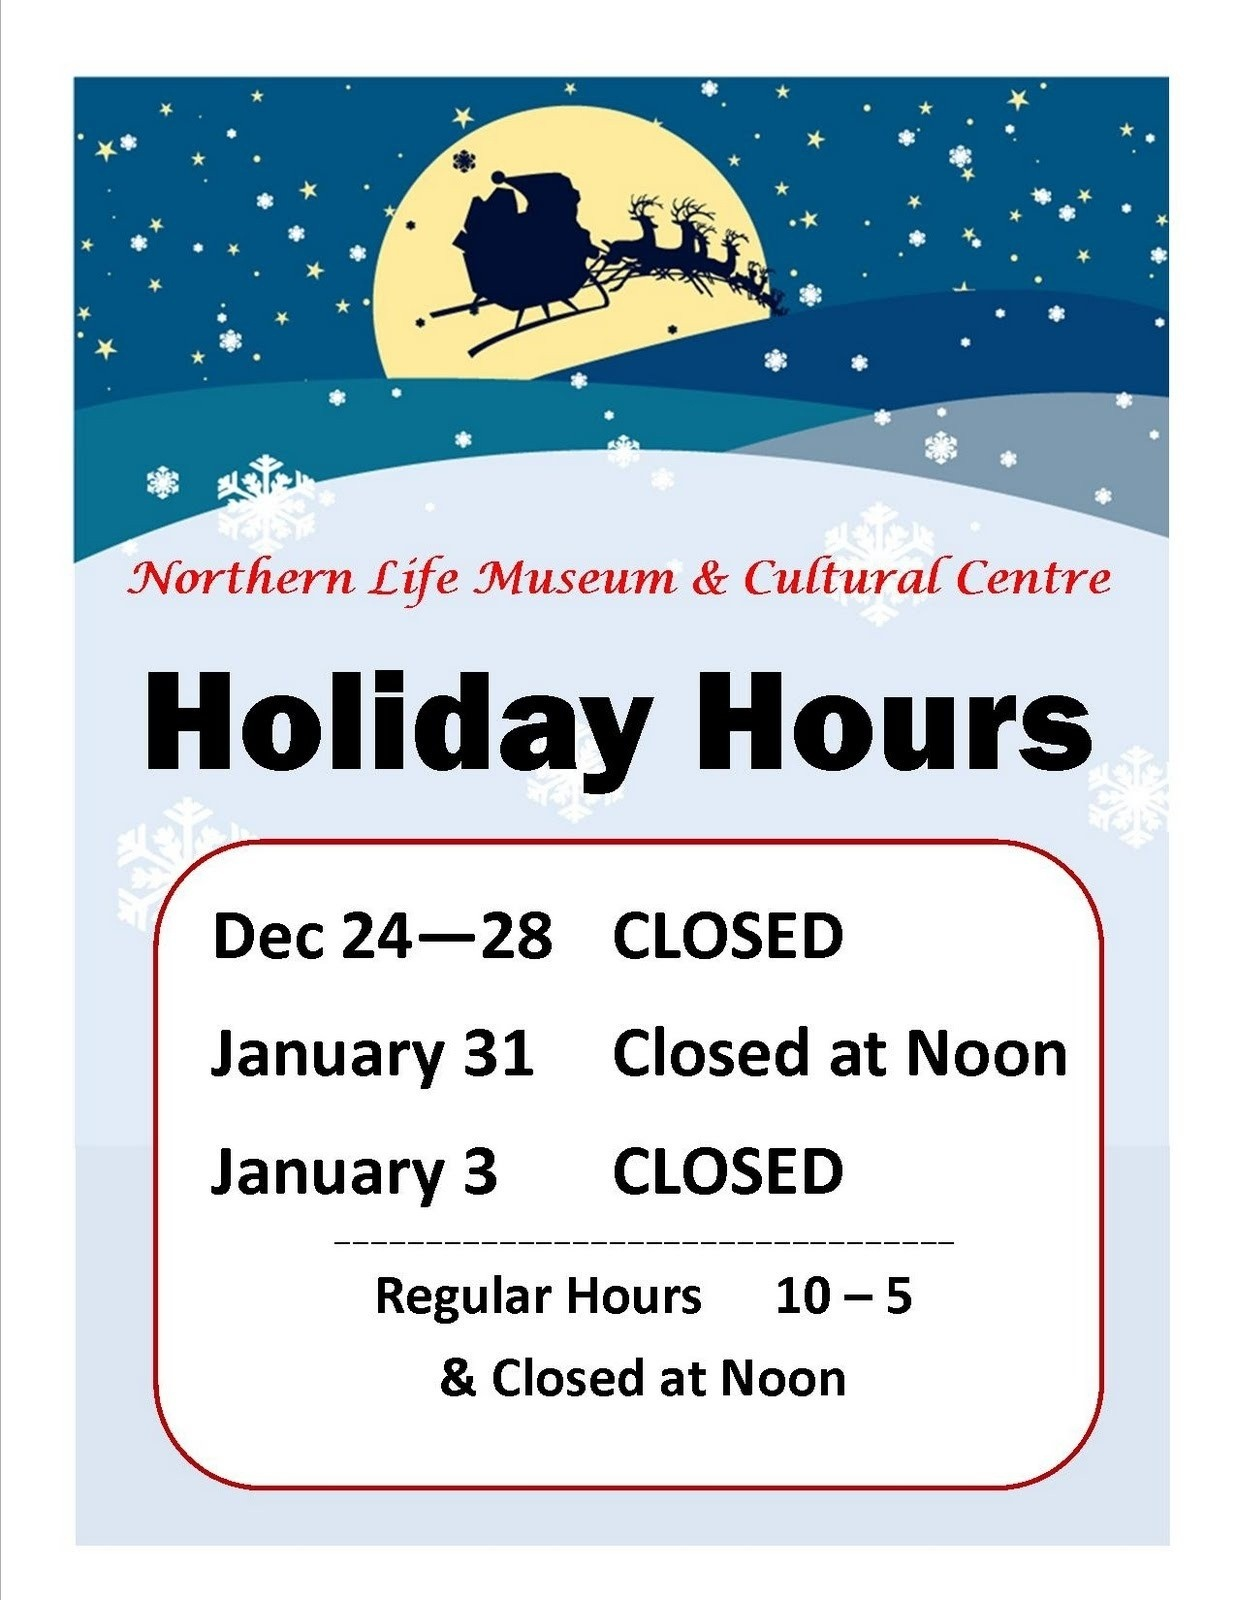 Holiday Closing Signs Templates Free Printable Closed 18 - Free Printable Holiday Closed Signs